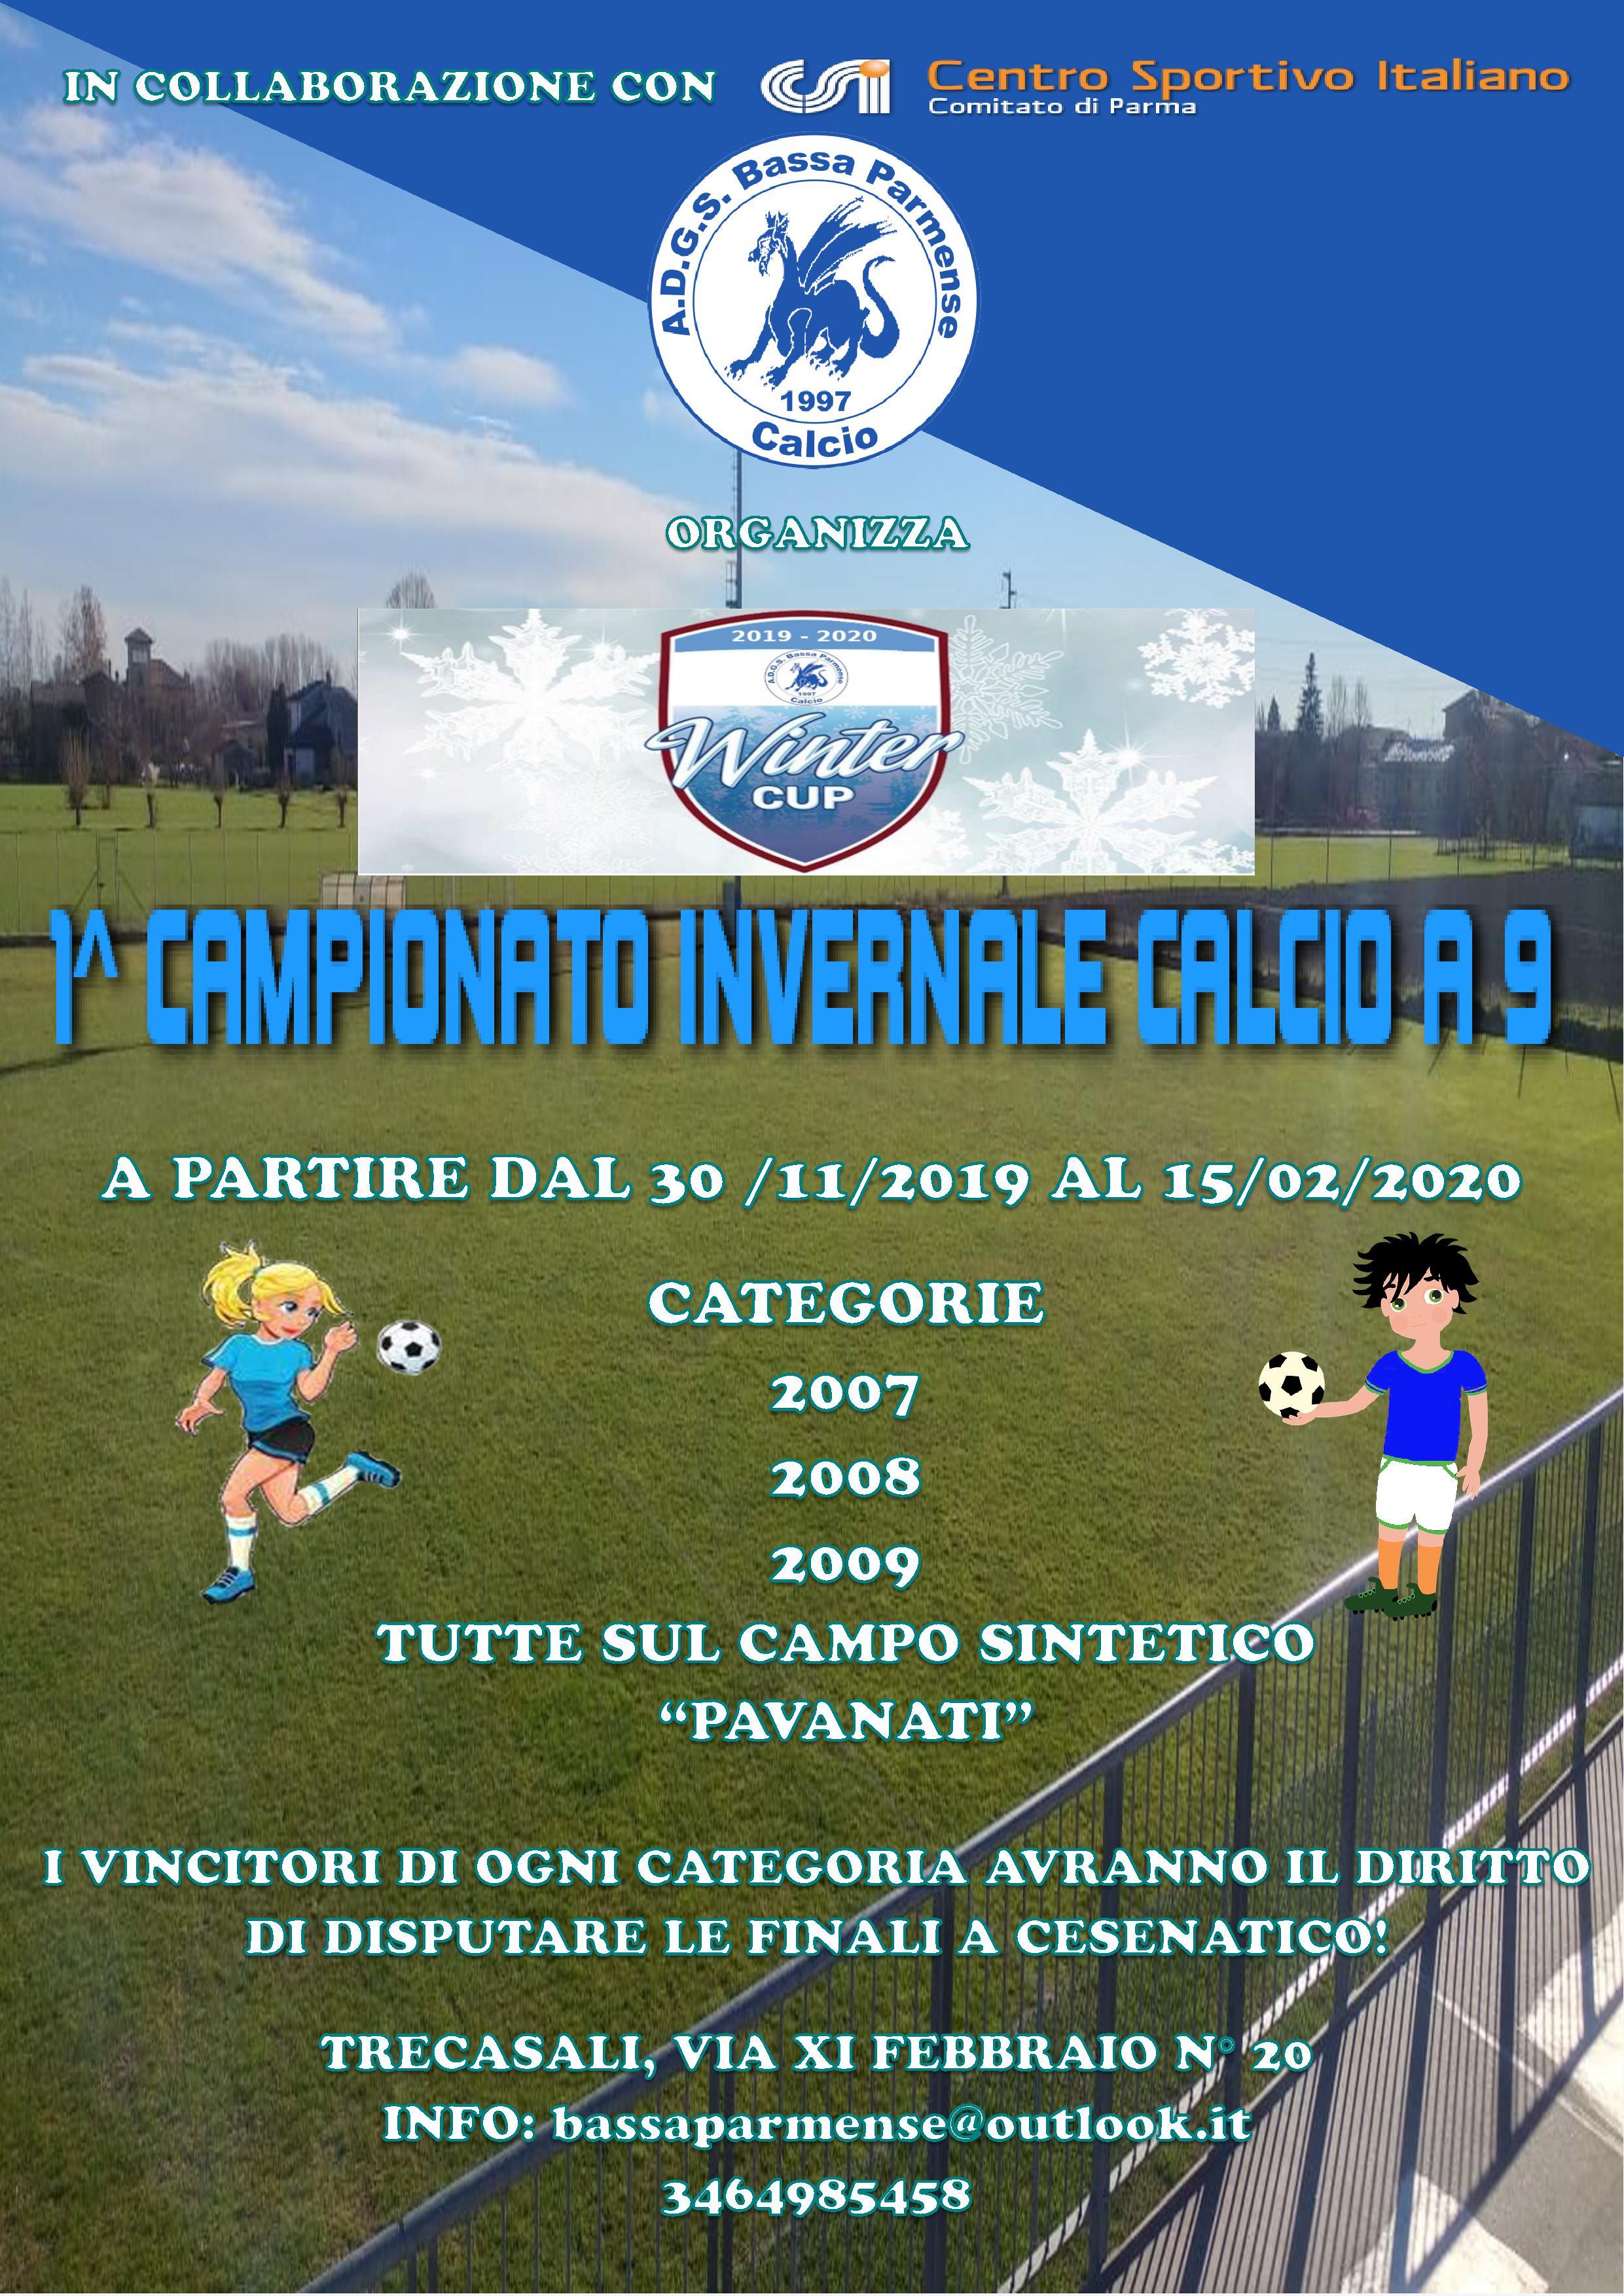 1° Campionato Invernale - Winter Cup